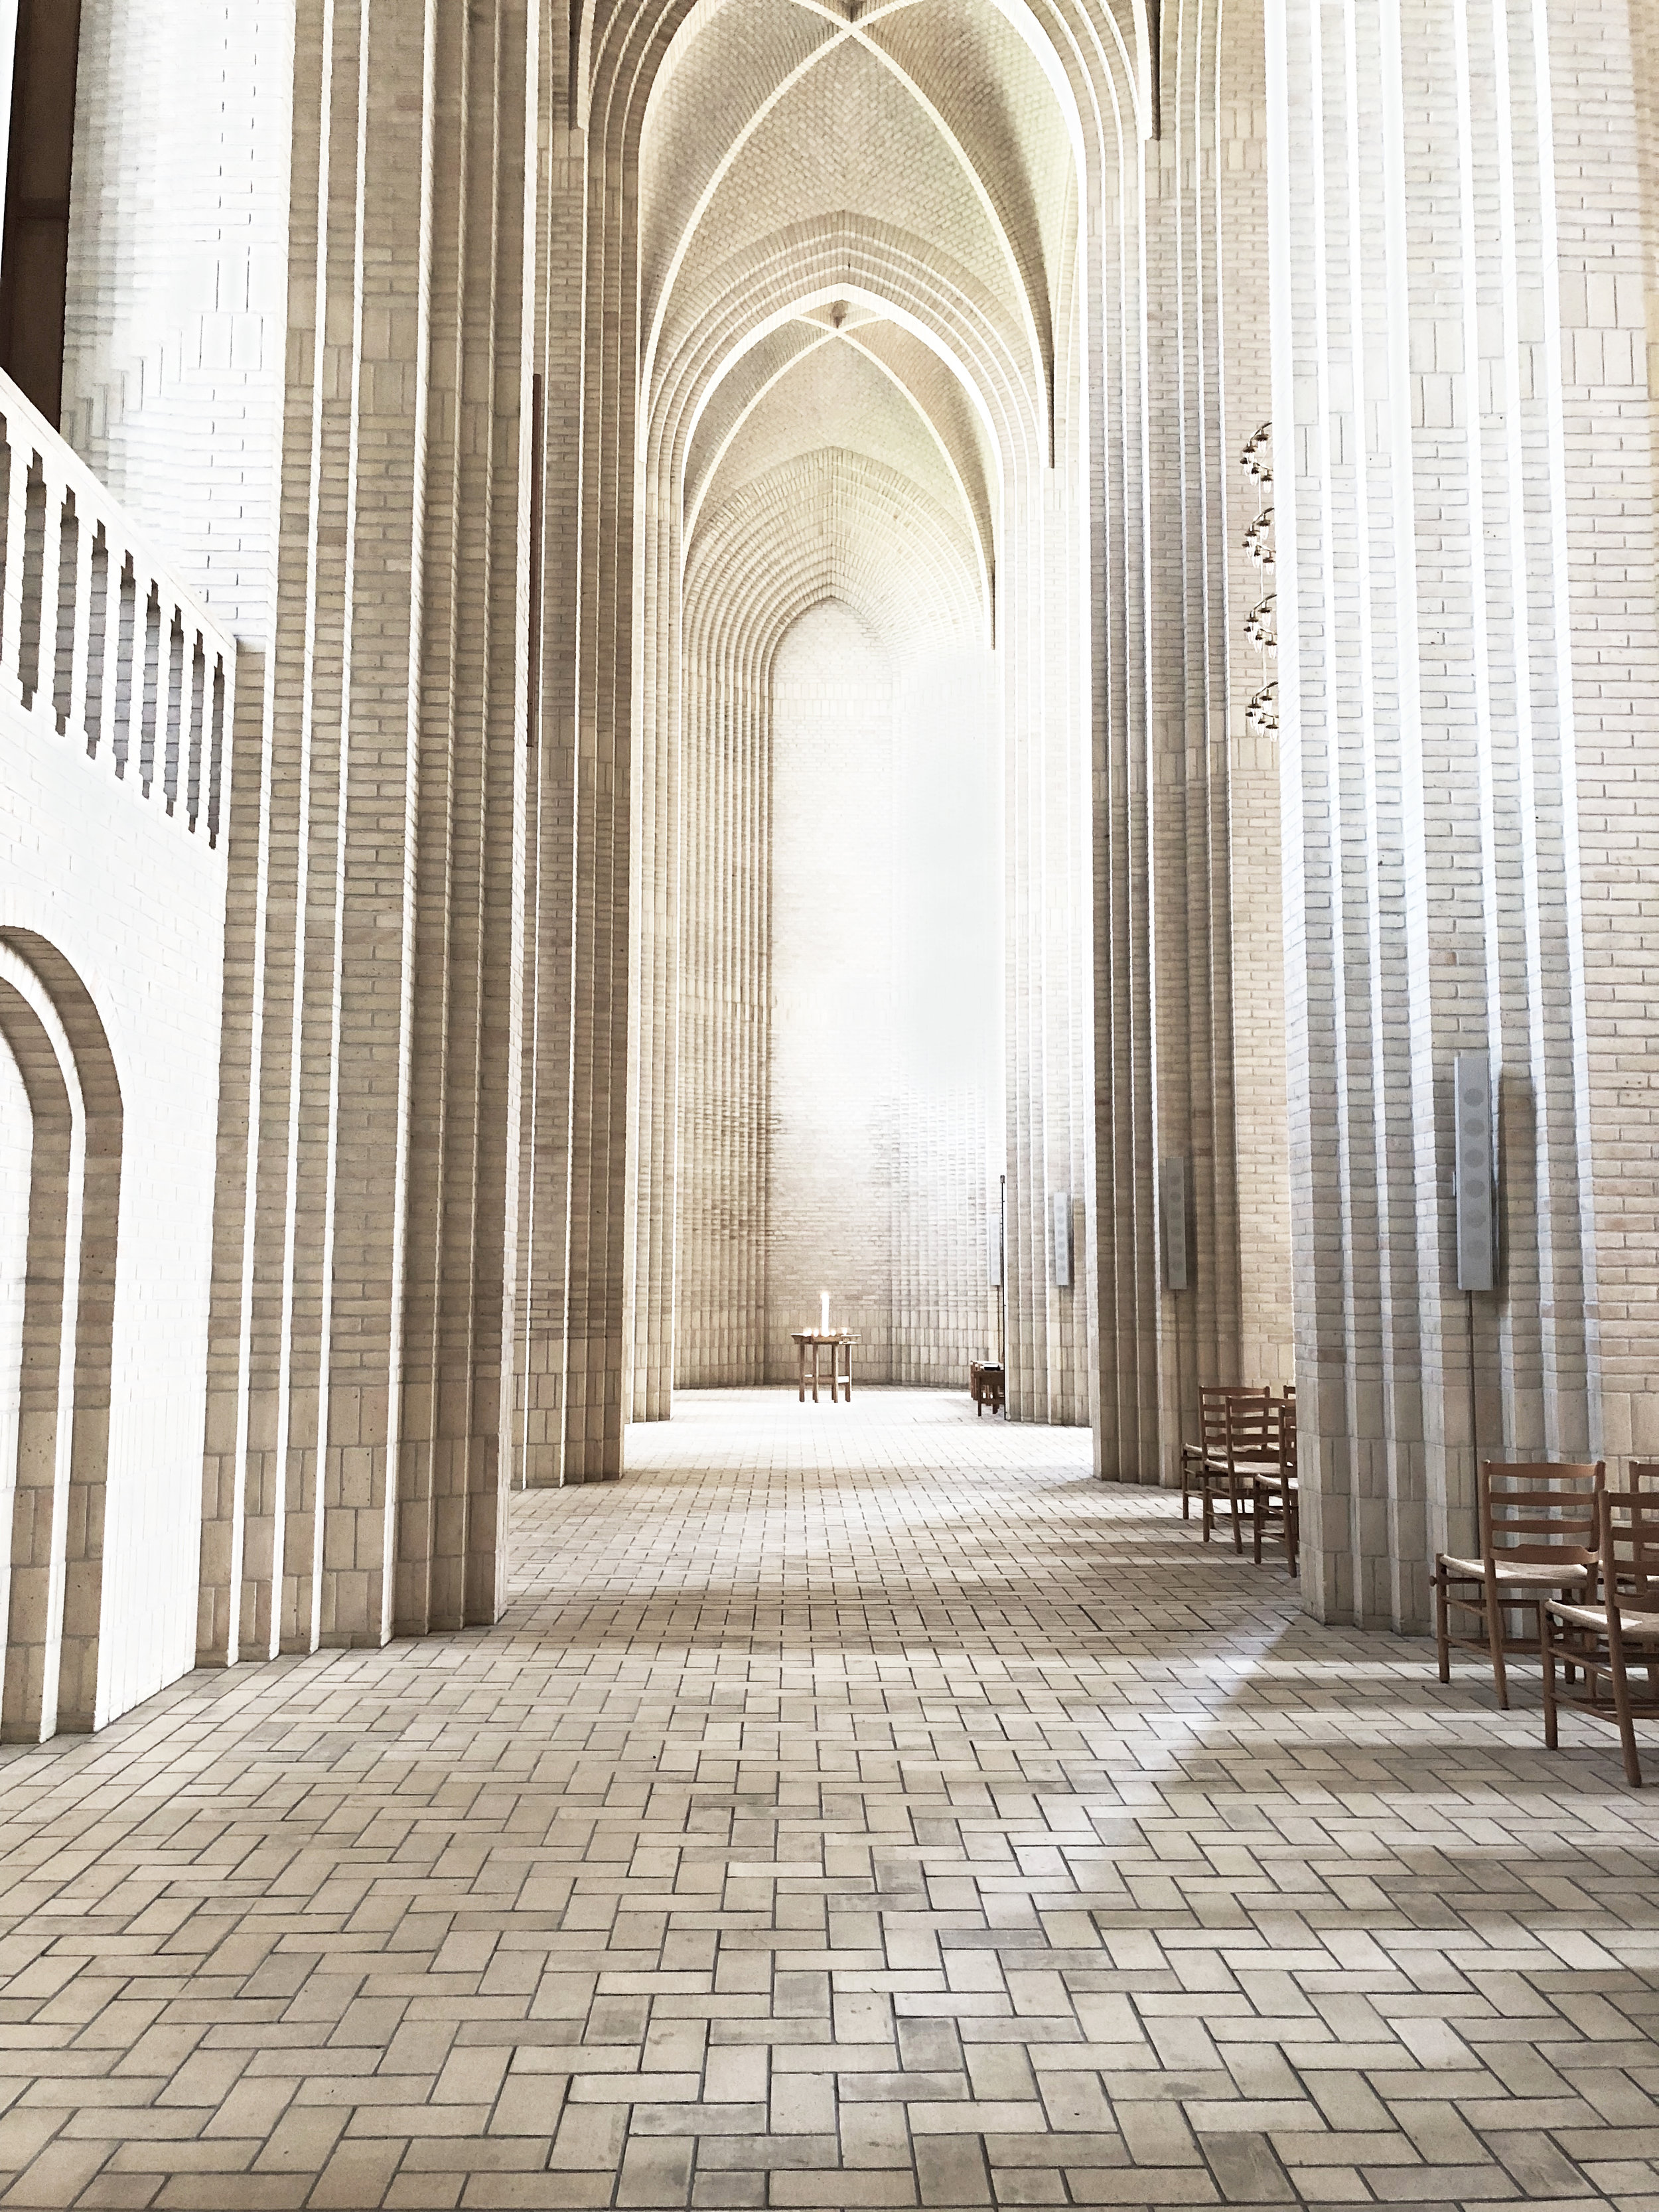 StudioGabrielle_Guide_Copenhagen_StylistEye_GrundtvigChurch